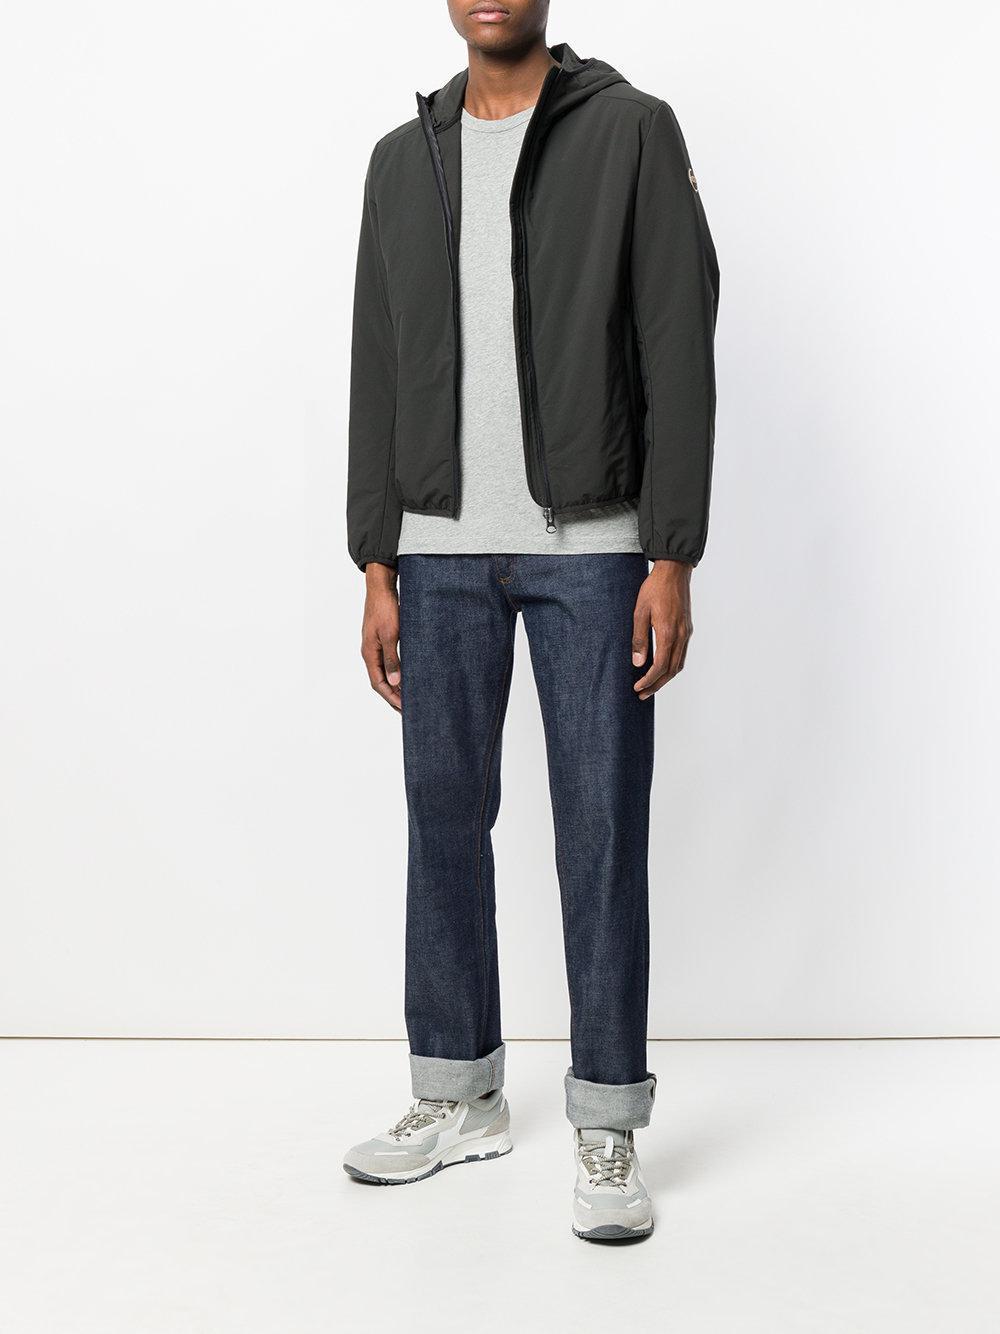 Colmar Synthetic Zip-up Hooded Jacket in Black for Men